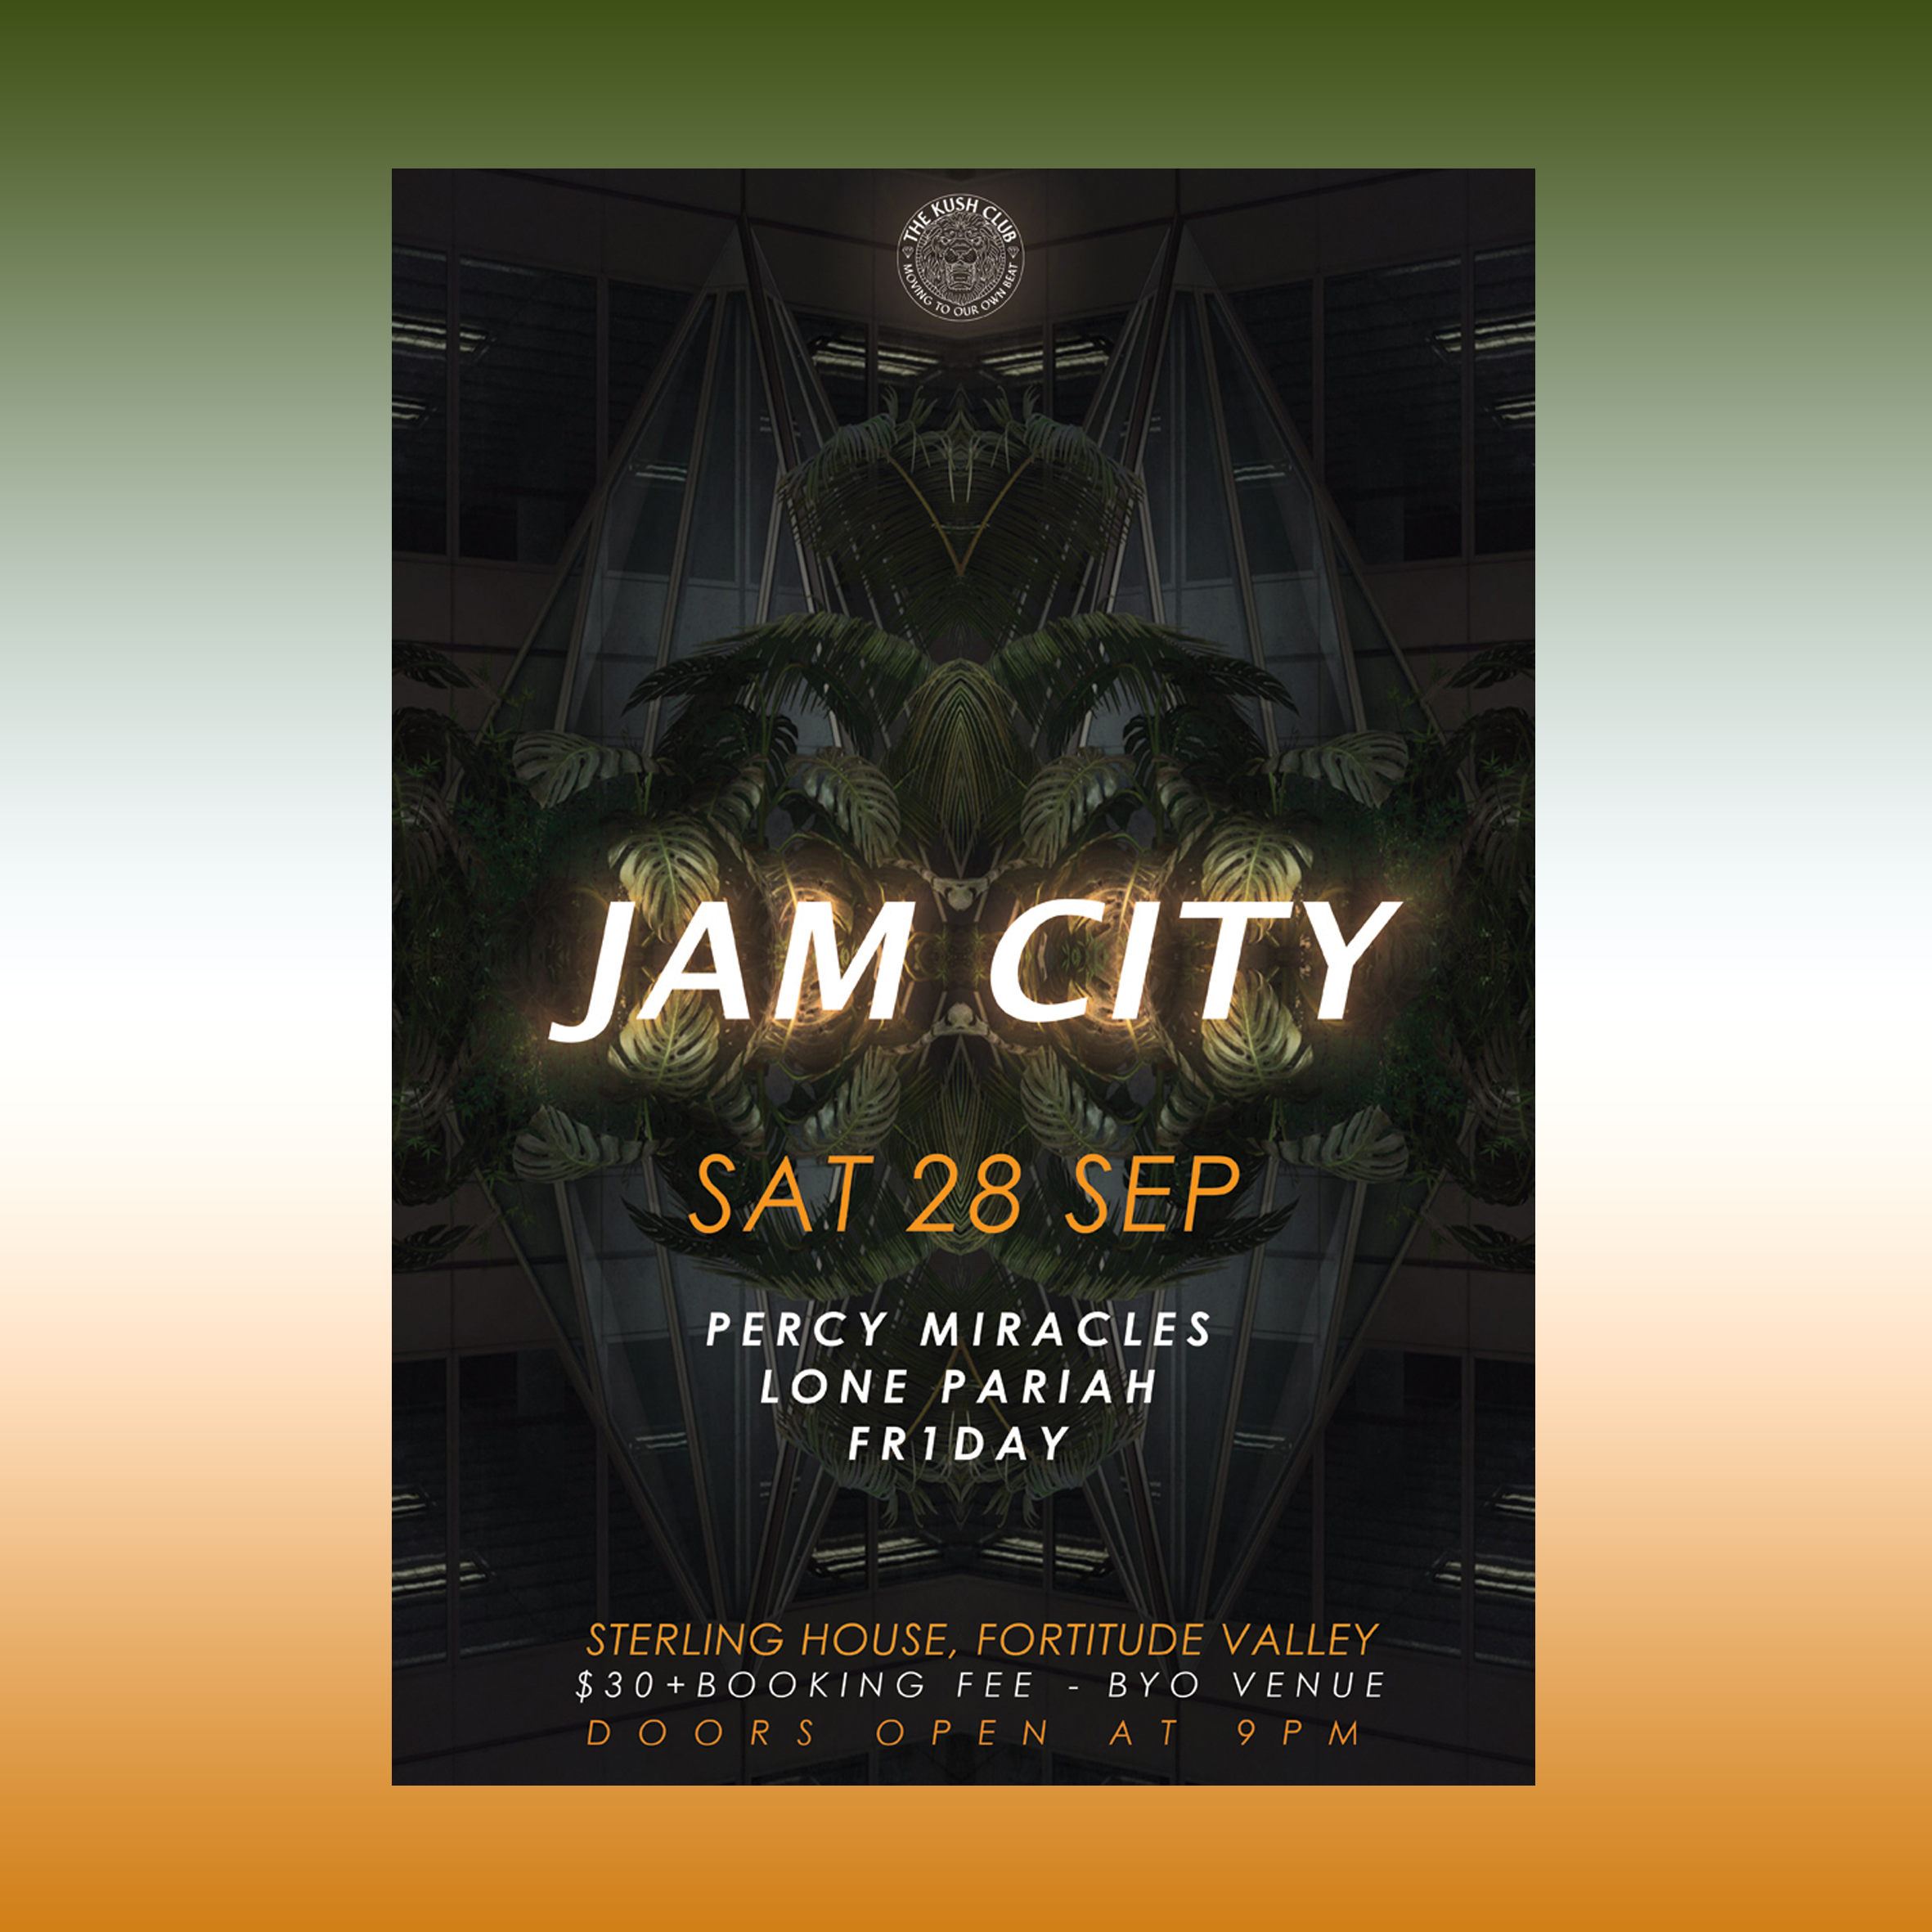 Jam City poster